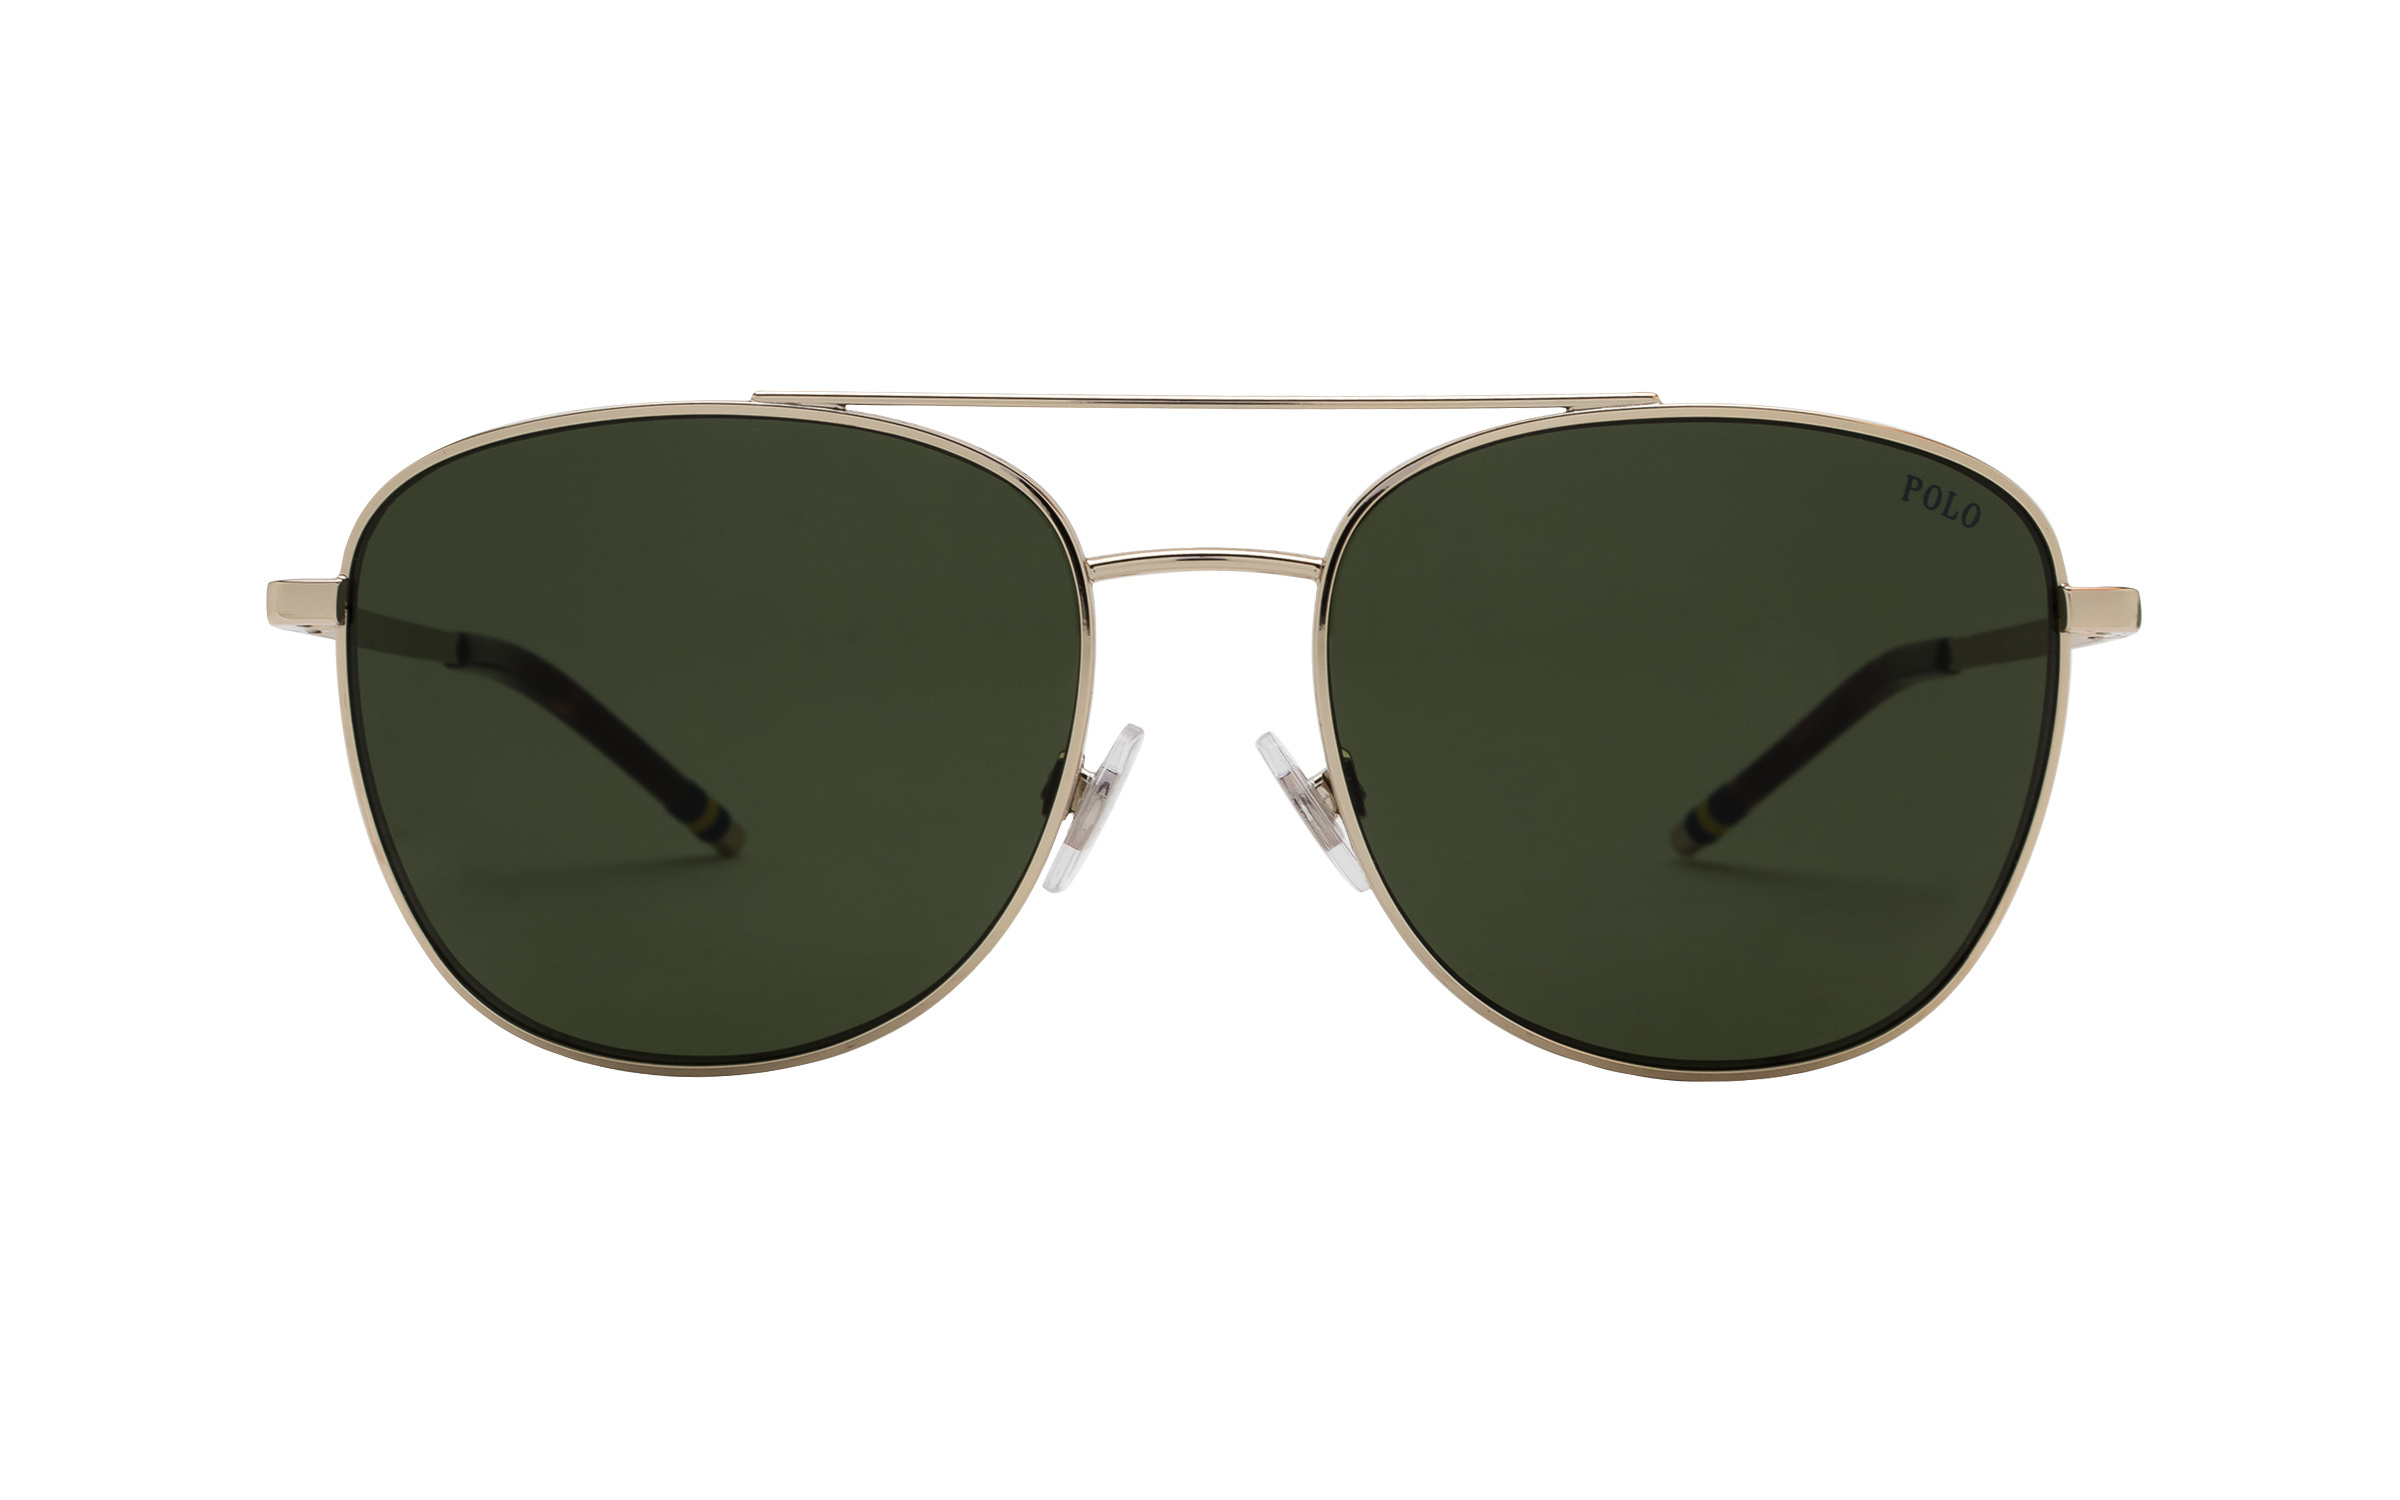 Luxottica Polo Ralph Lauren PH3127 911671 57 Sunglasses in Gold | Plastic/Metal - Online Coastal